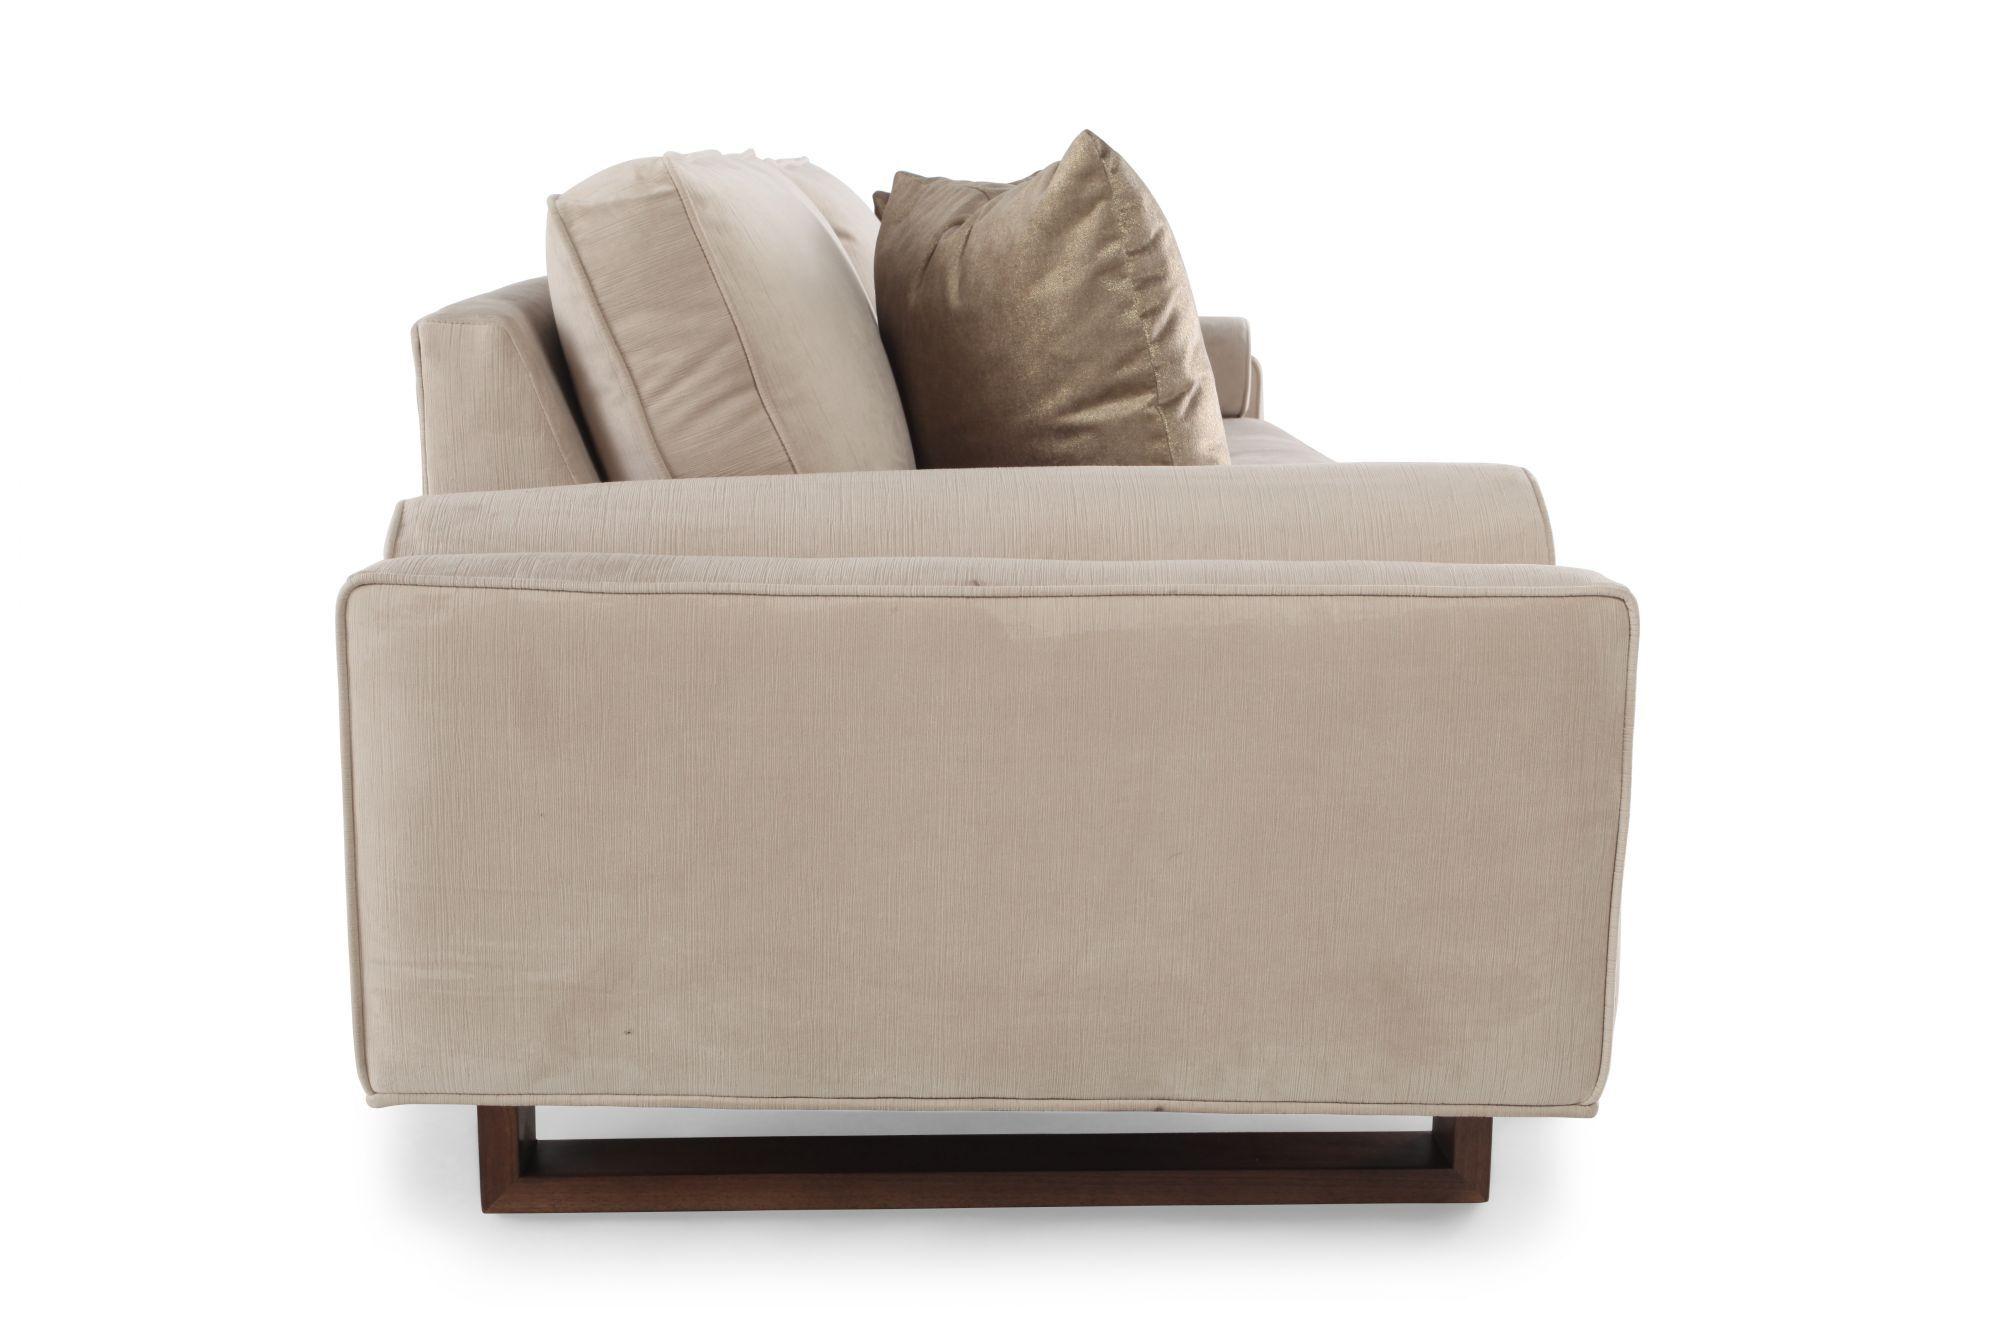 Jonathan Louis Bennett Sofa Mathis Brothers Furniture  sc 1 st  Okaycreations.net | Sofa Minimalist Modern : jonathan louis bennett chaise - Sectionals, Sofas & Couches